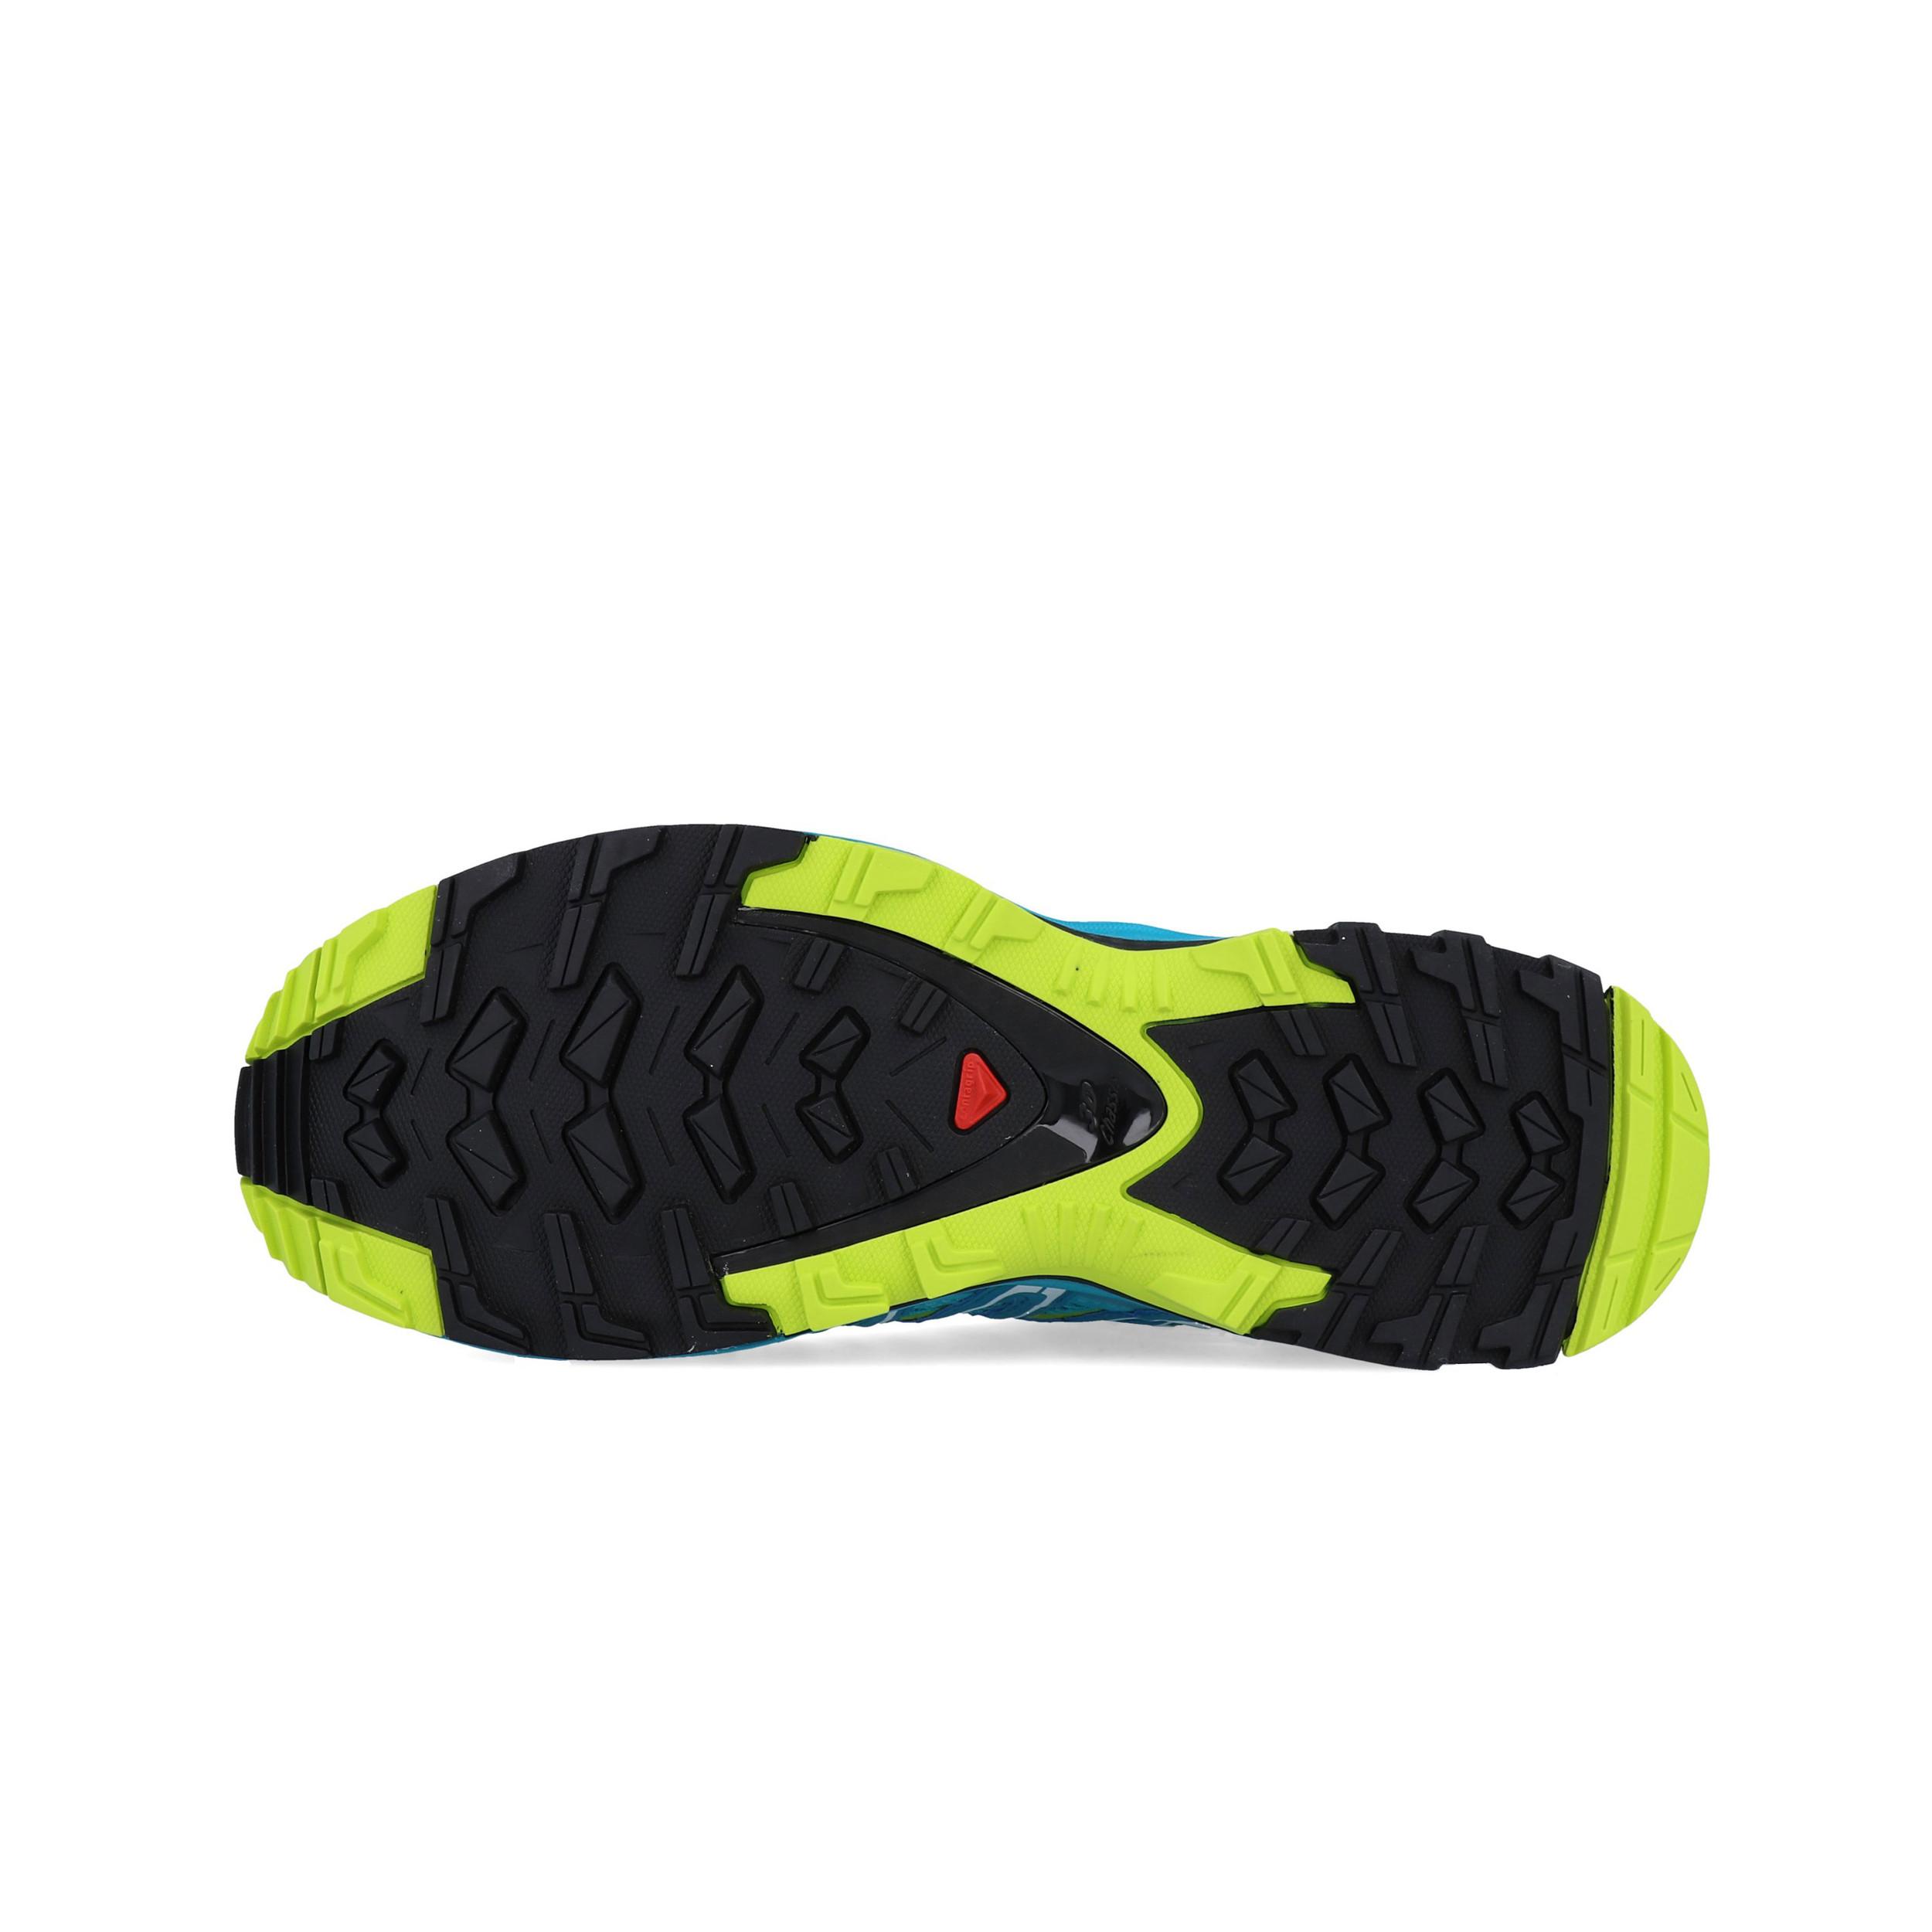 Salomon Donna XA Pro 3D Trail Scarpe Da Corsa Ginnastica Sport Sneakers Blu 0aa1d014069